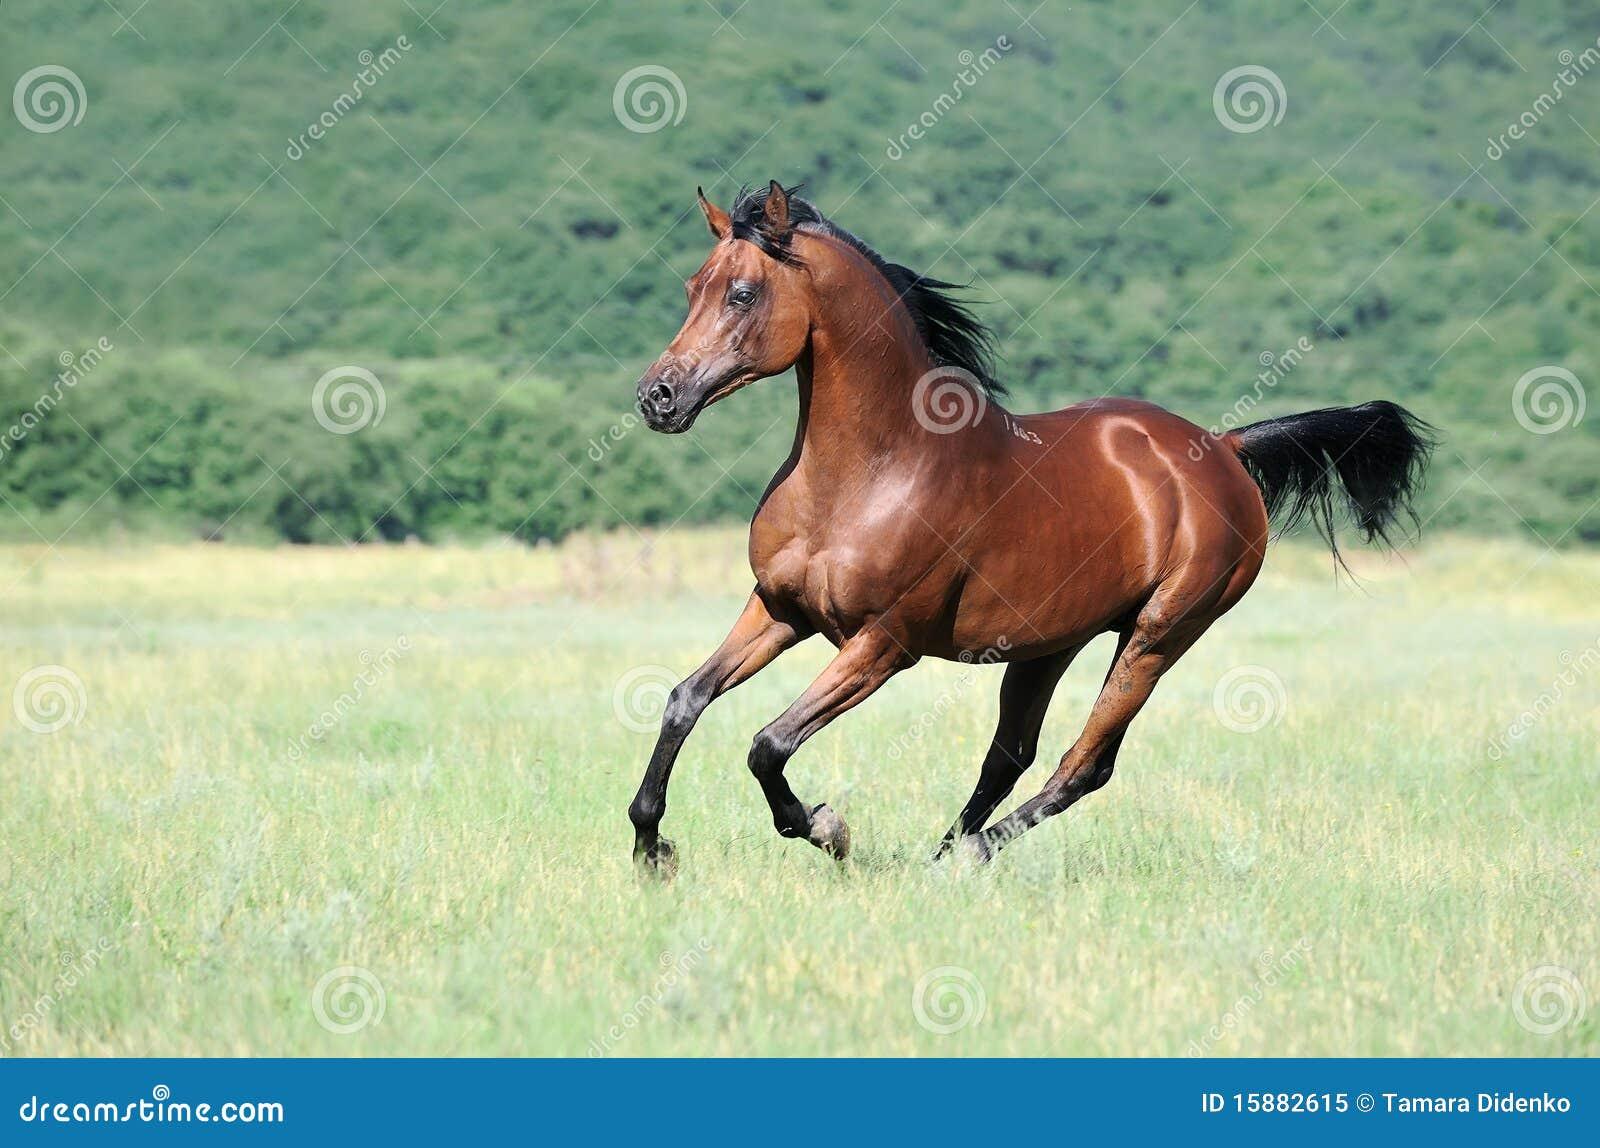 Brown Arabian Horse Running Gallop On Pasture Stock Image